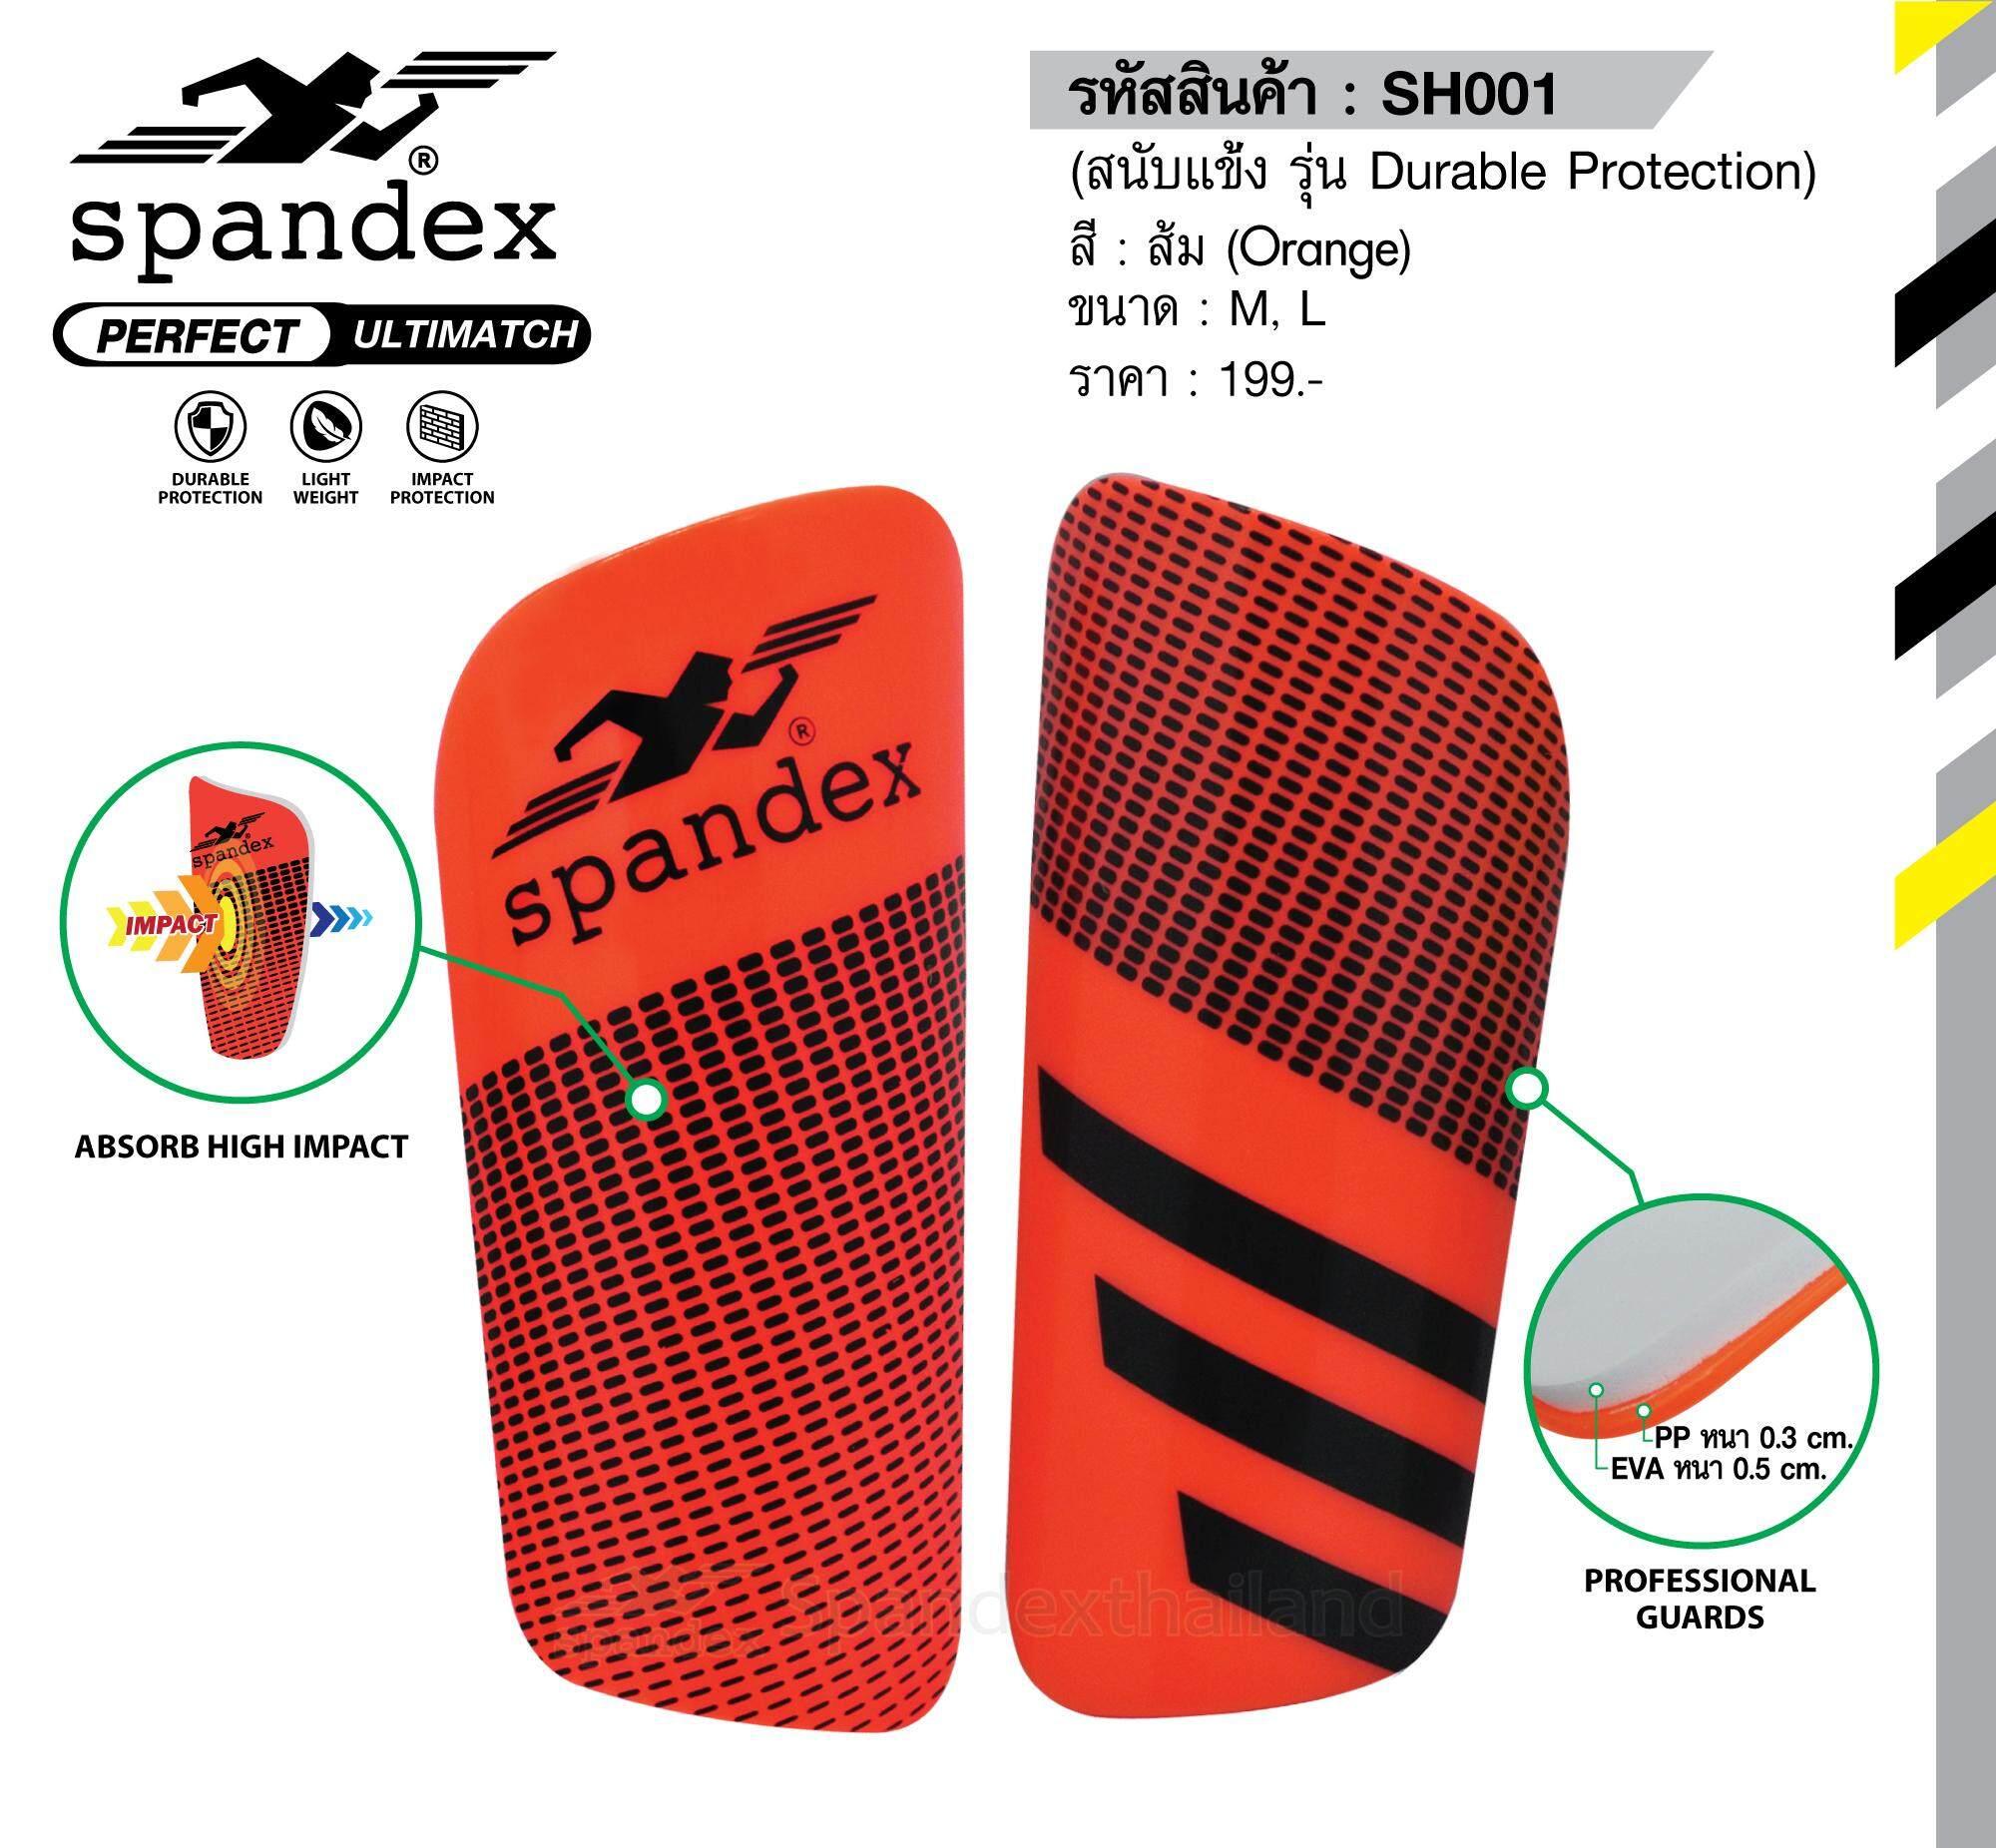 Spandex Sh001 สนับแข้ง สีส้ม S.